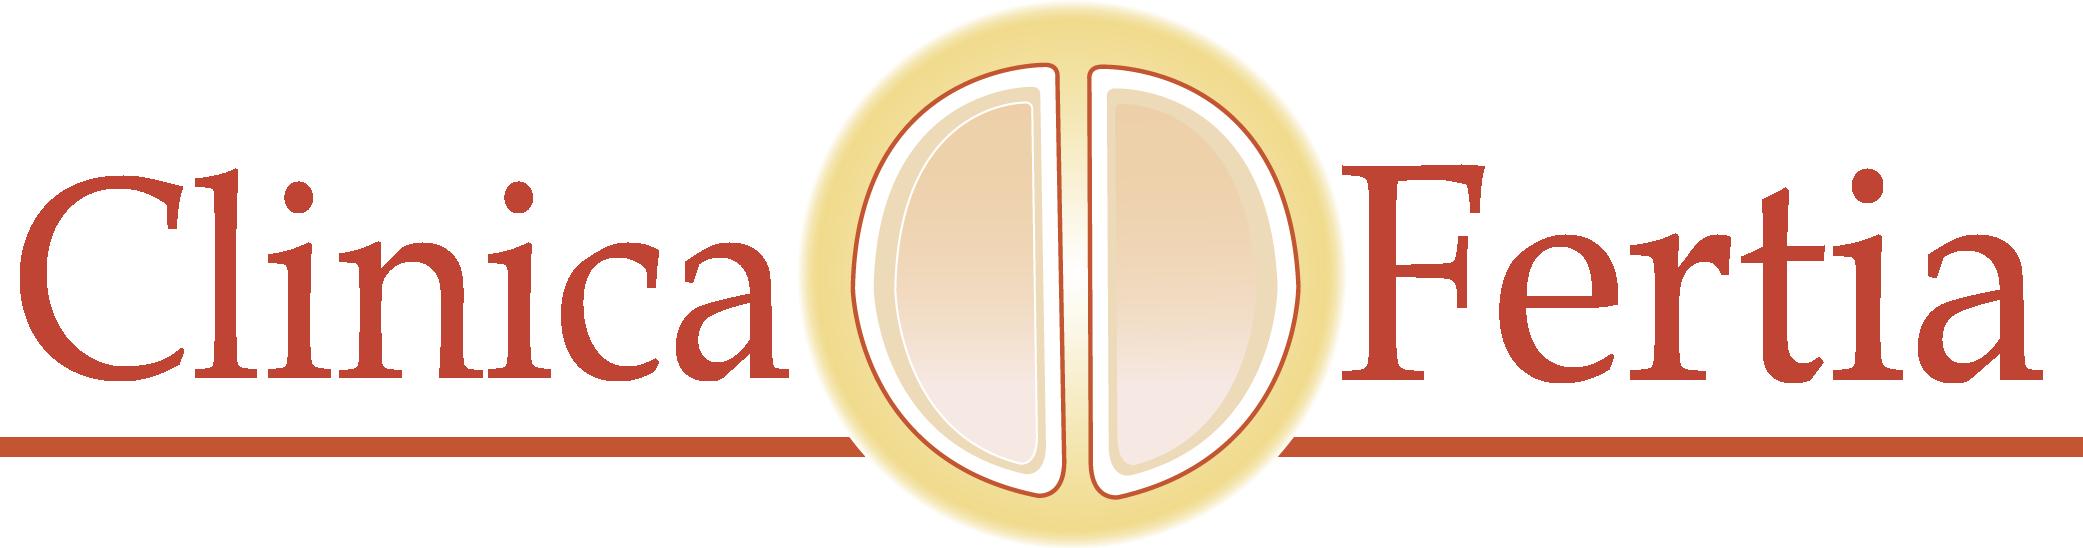 Clínica Fertia